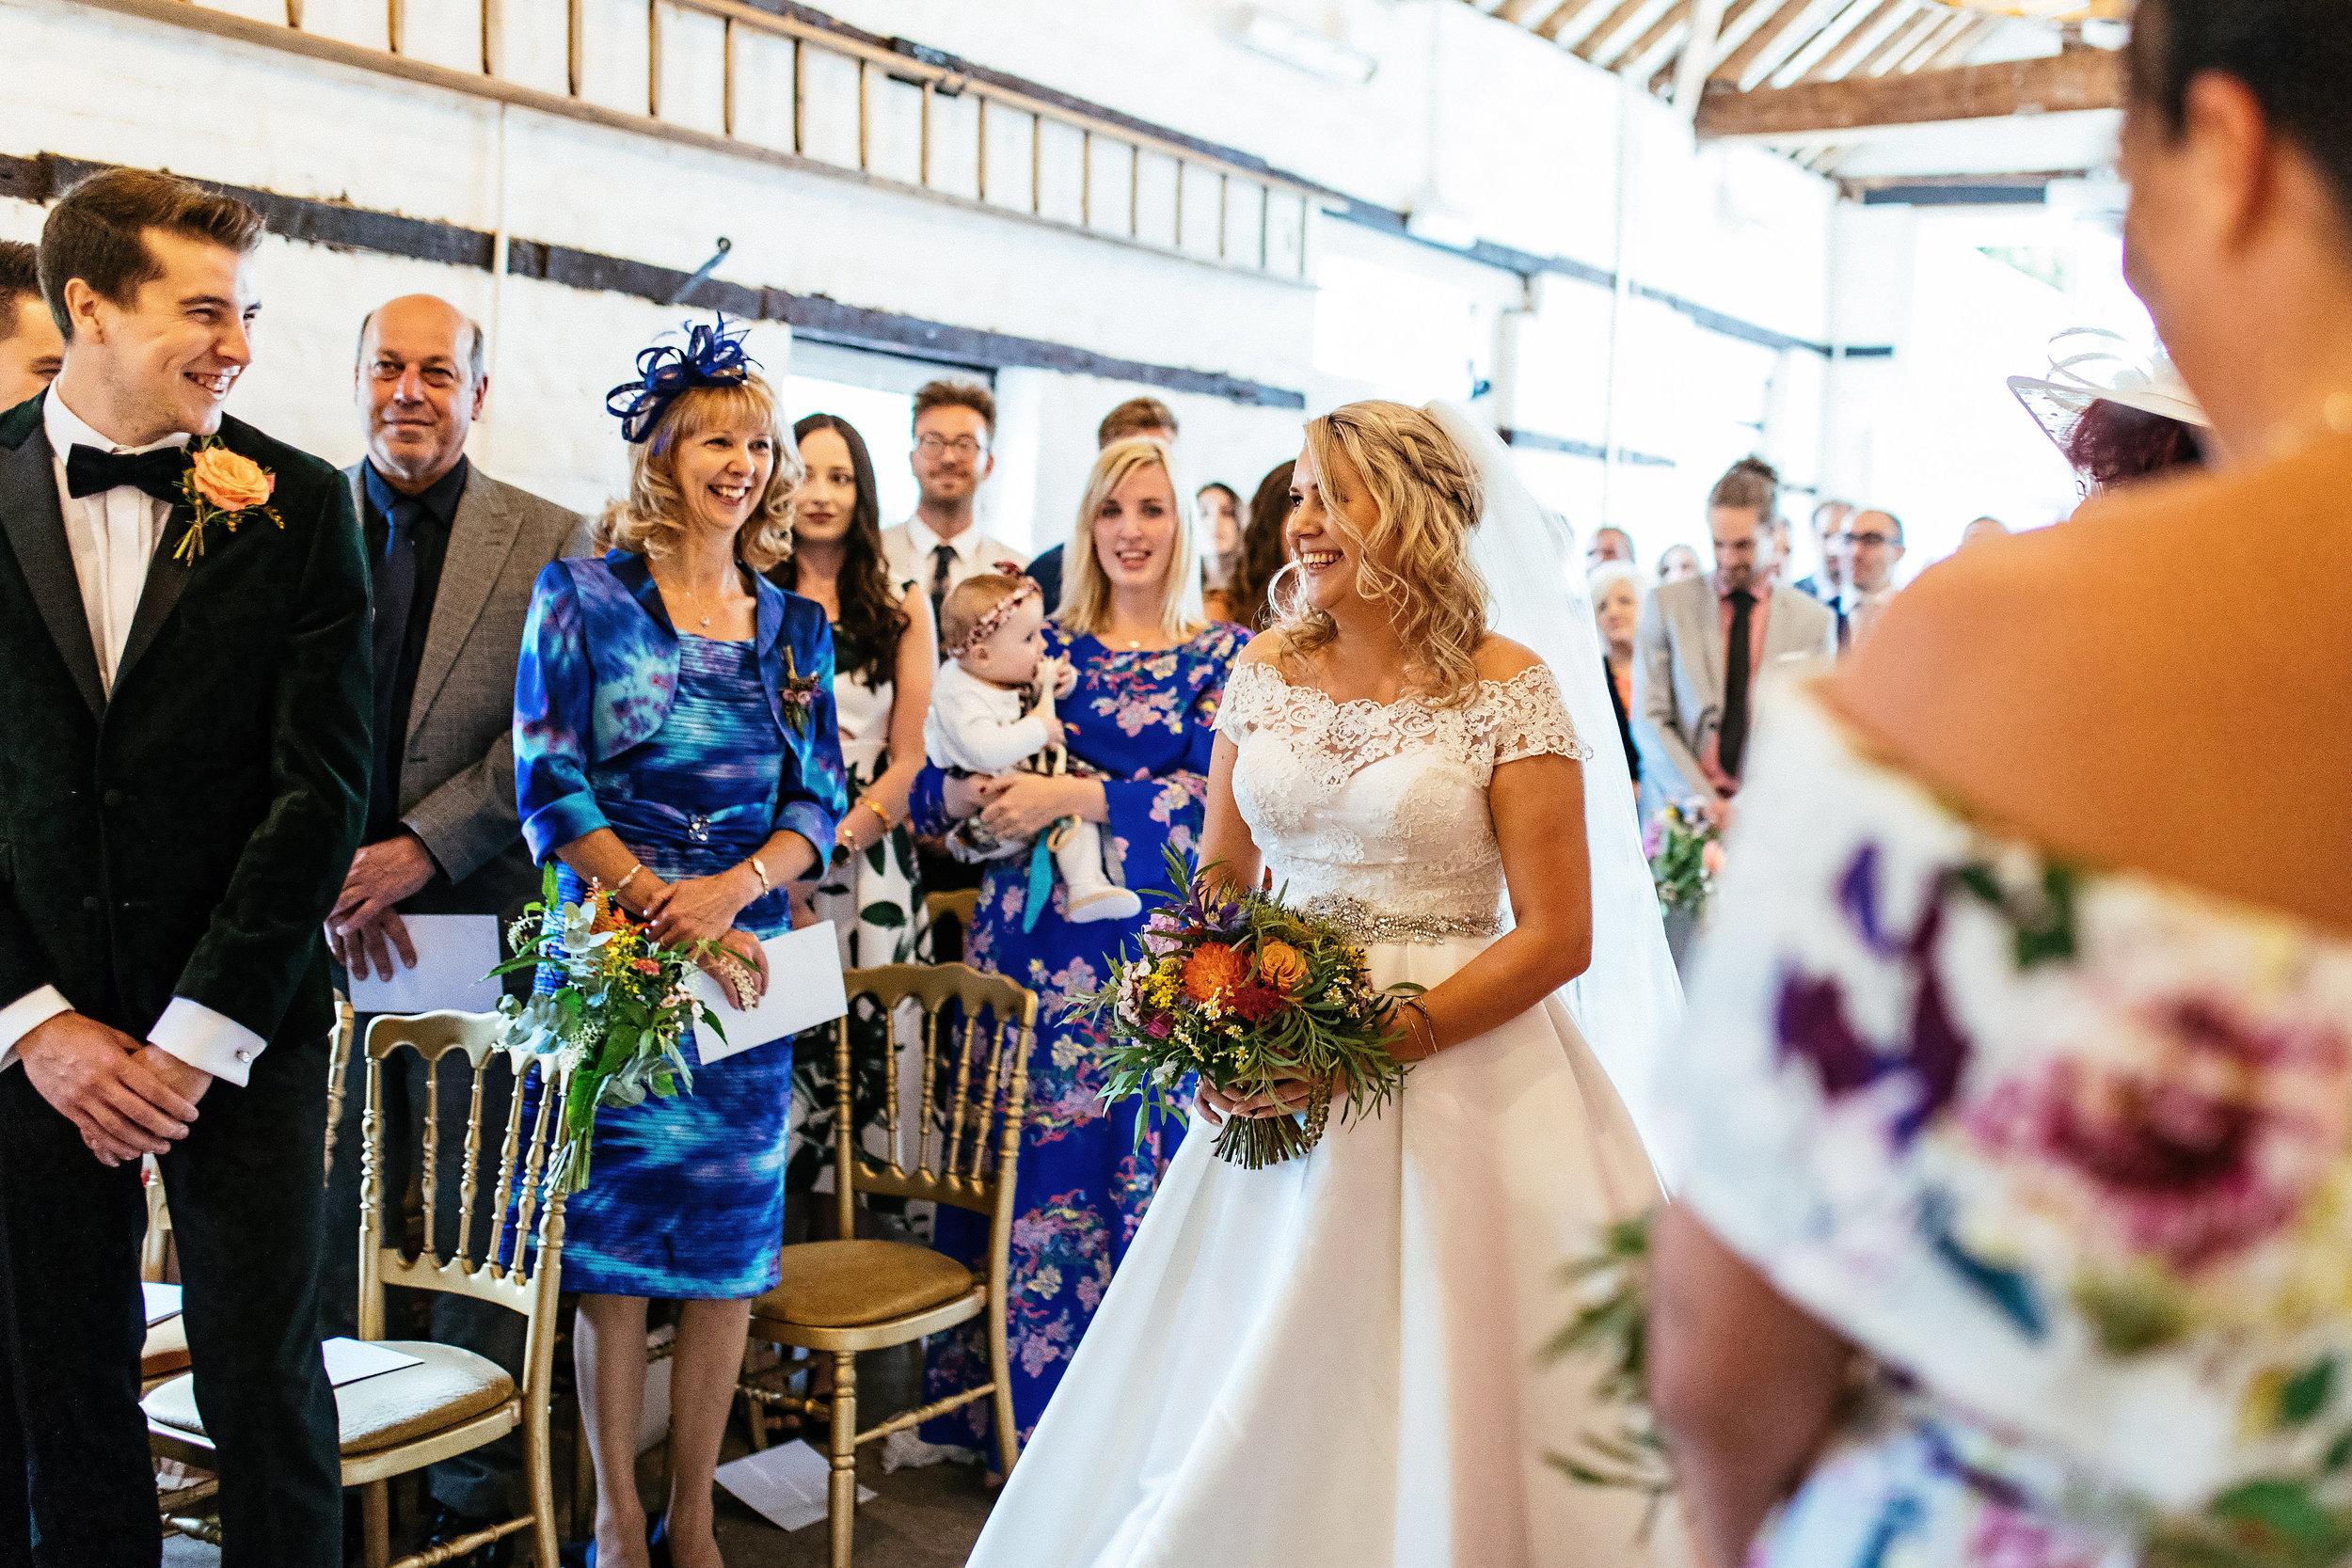 Tamara-and-Richard-Wedding-Highlights-21.jpg